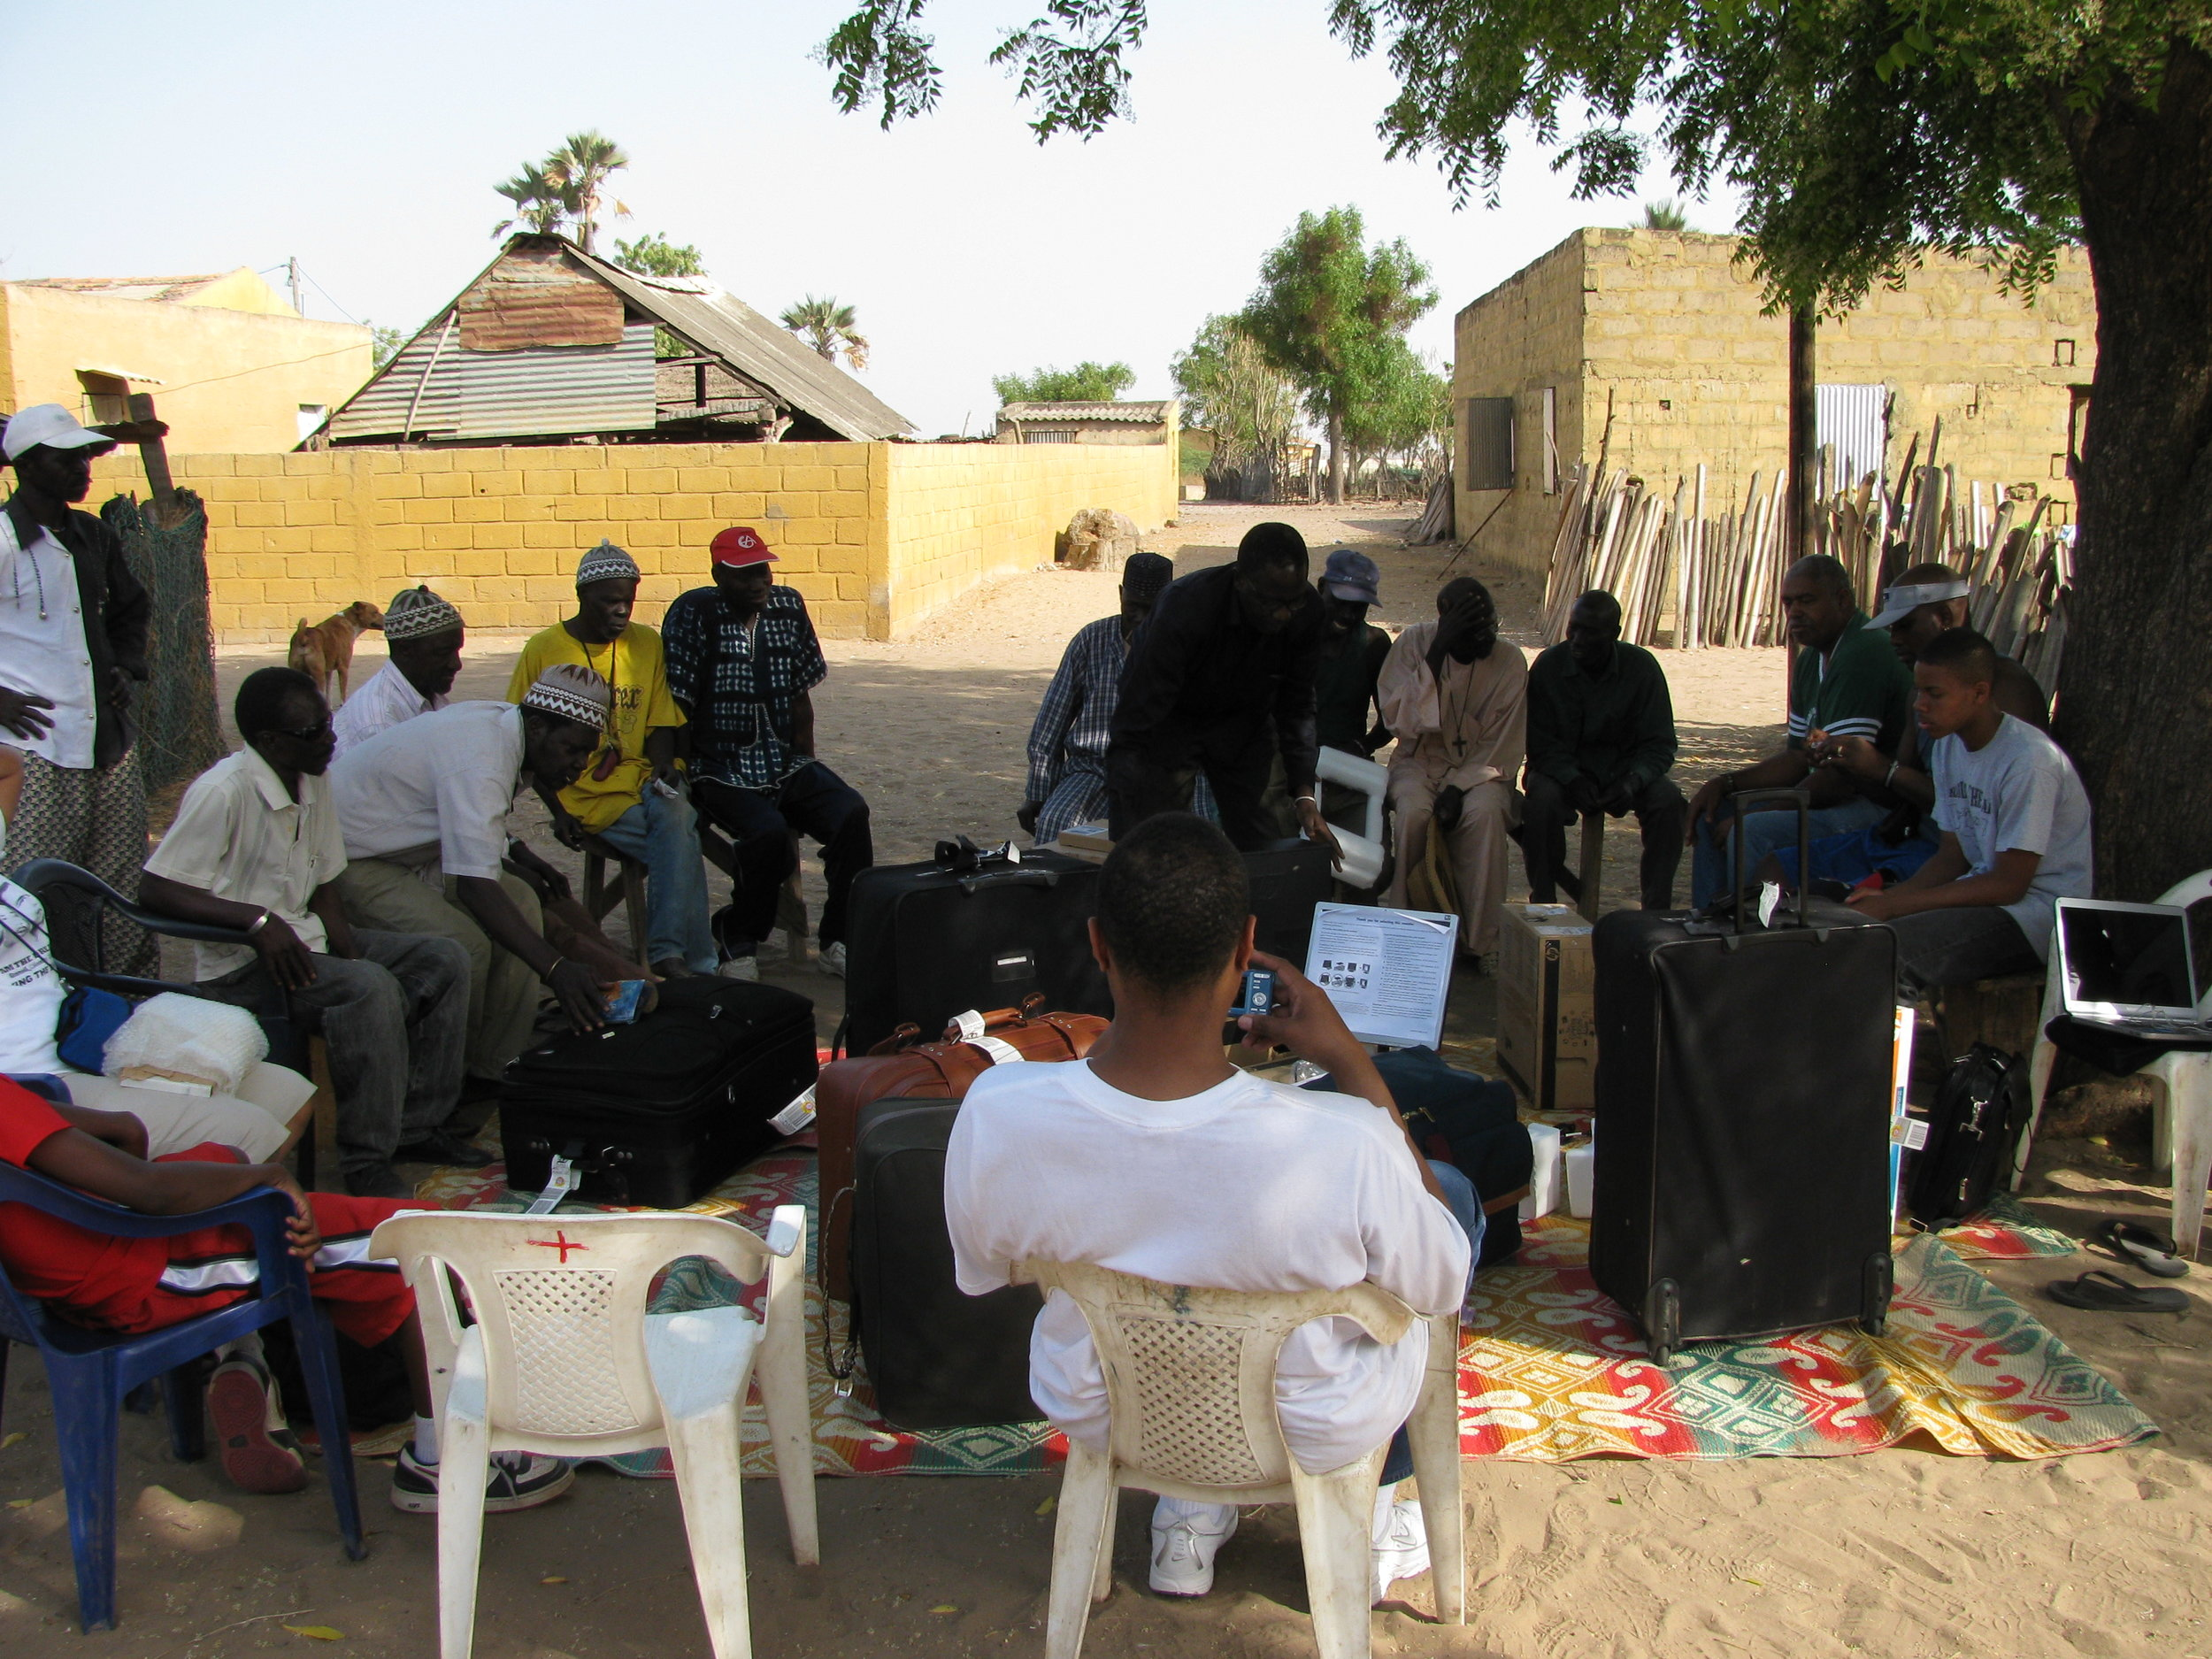 Africa--2009-Dijiloor, Dijidiack, Senegal, West Africa 144.jpg